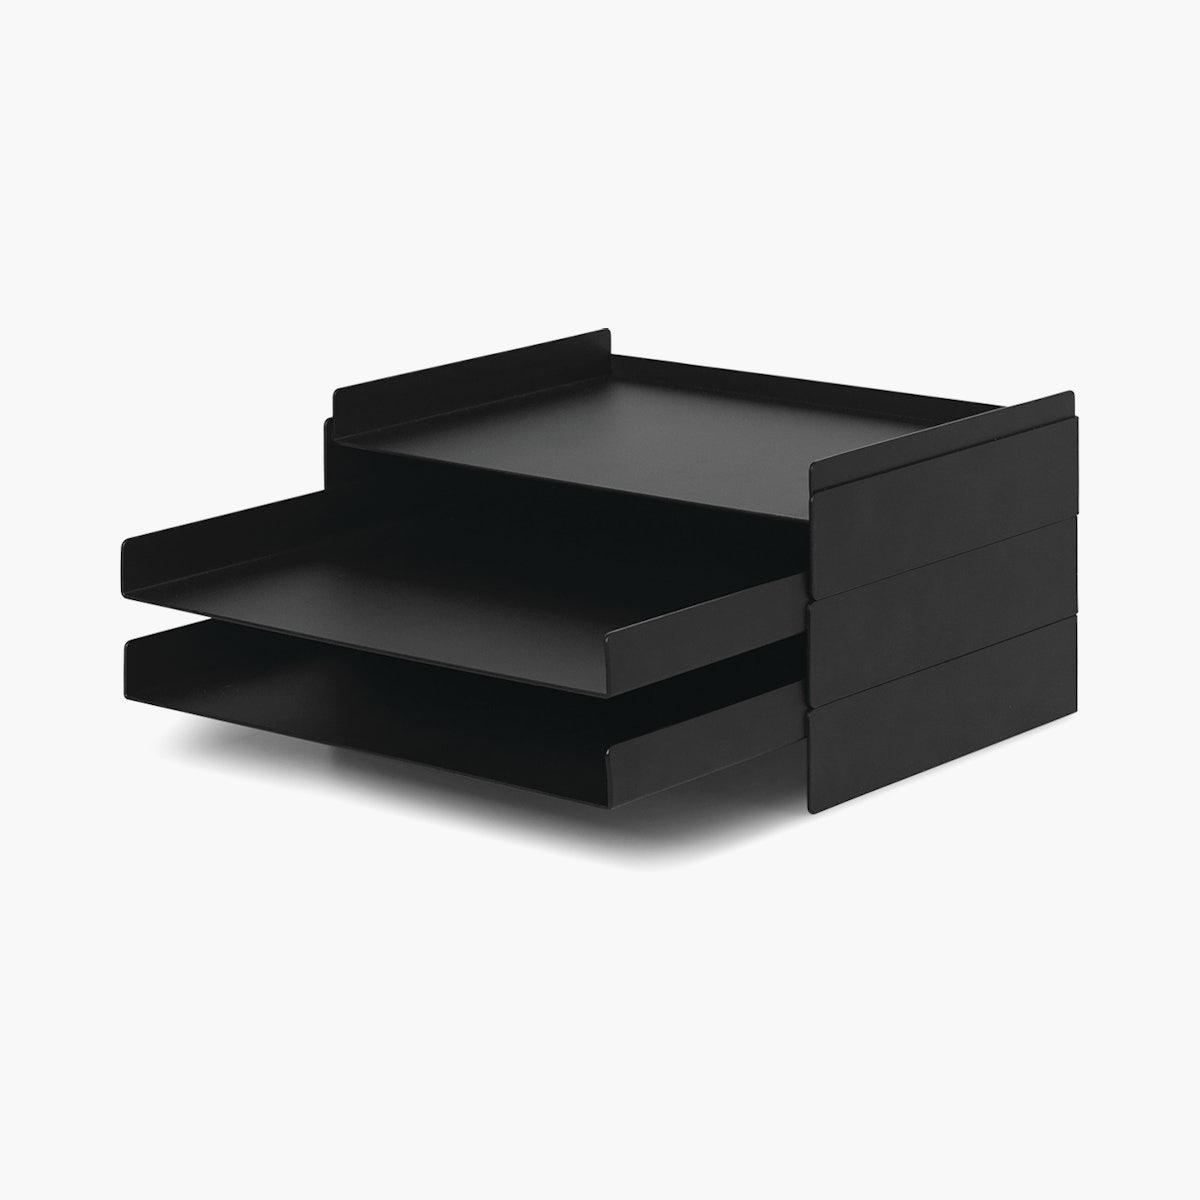 2x2 Paper Organizer